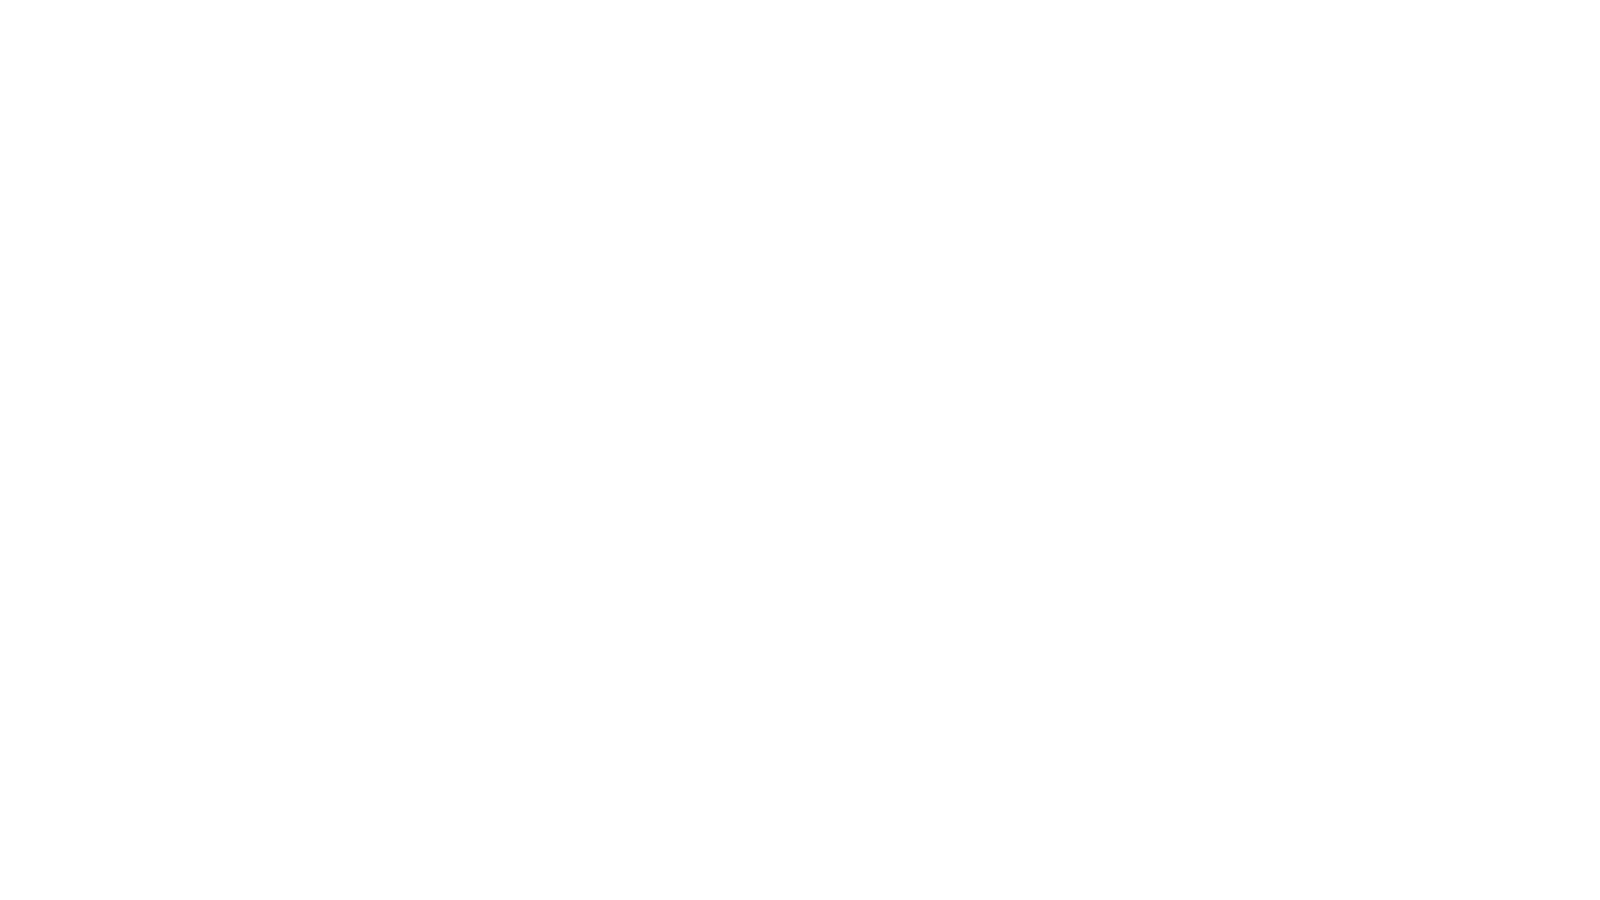 Tajuk Lagu: TUHAN INILAH HIDUP KU Ciptaan : Johan Chrisdianto Minus One: https://youtu.be/UpLUciFMUjI  Penyanyi : SEL KANAK-KANAK PAROKI ST. LUKE, TELUPID, SABAH Allysha David, Ardiya Listina, Azlie Danny, Ivan Jhoy, Jeannysika Lawrence, Lorine Fiona, Phoebe Genry Caluste, Spencer, Venneyruseel Roland.  *DIRAKAM DENGAN MENGGUNAKAN TELEFON PINTAR DI TEMPAT MASING-MASING  Diterbitkan oleh: MULTIMEDIA MINISTRY NETWORK https://www.multimediaministry.net